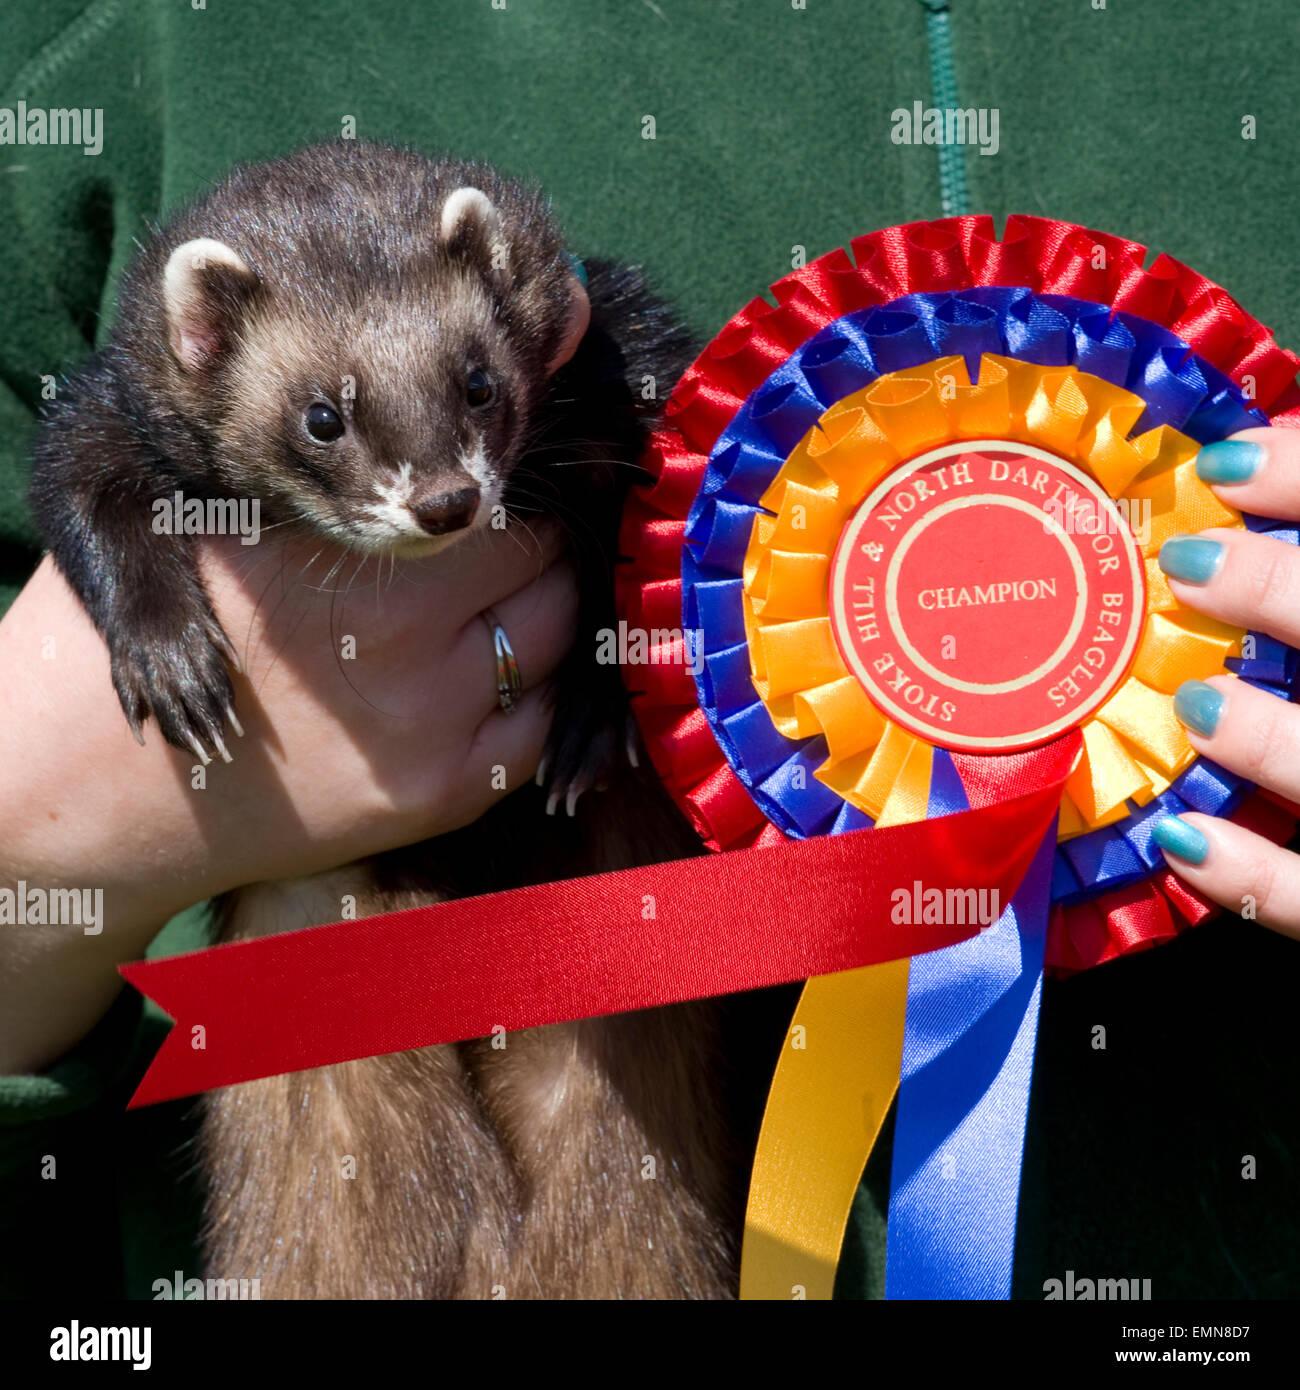 champion ferret - Stock Image